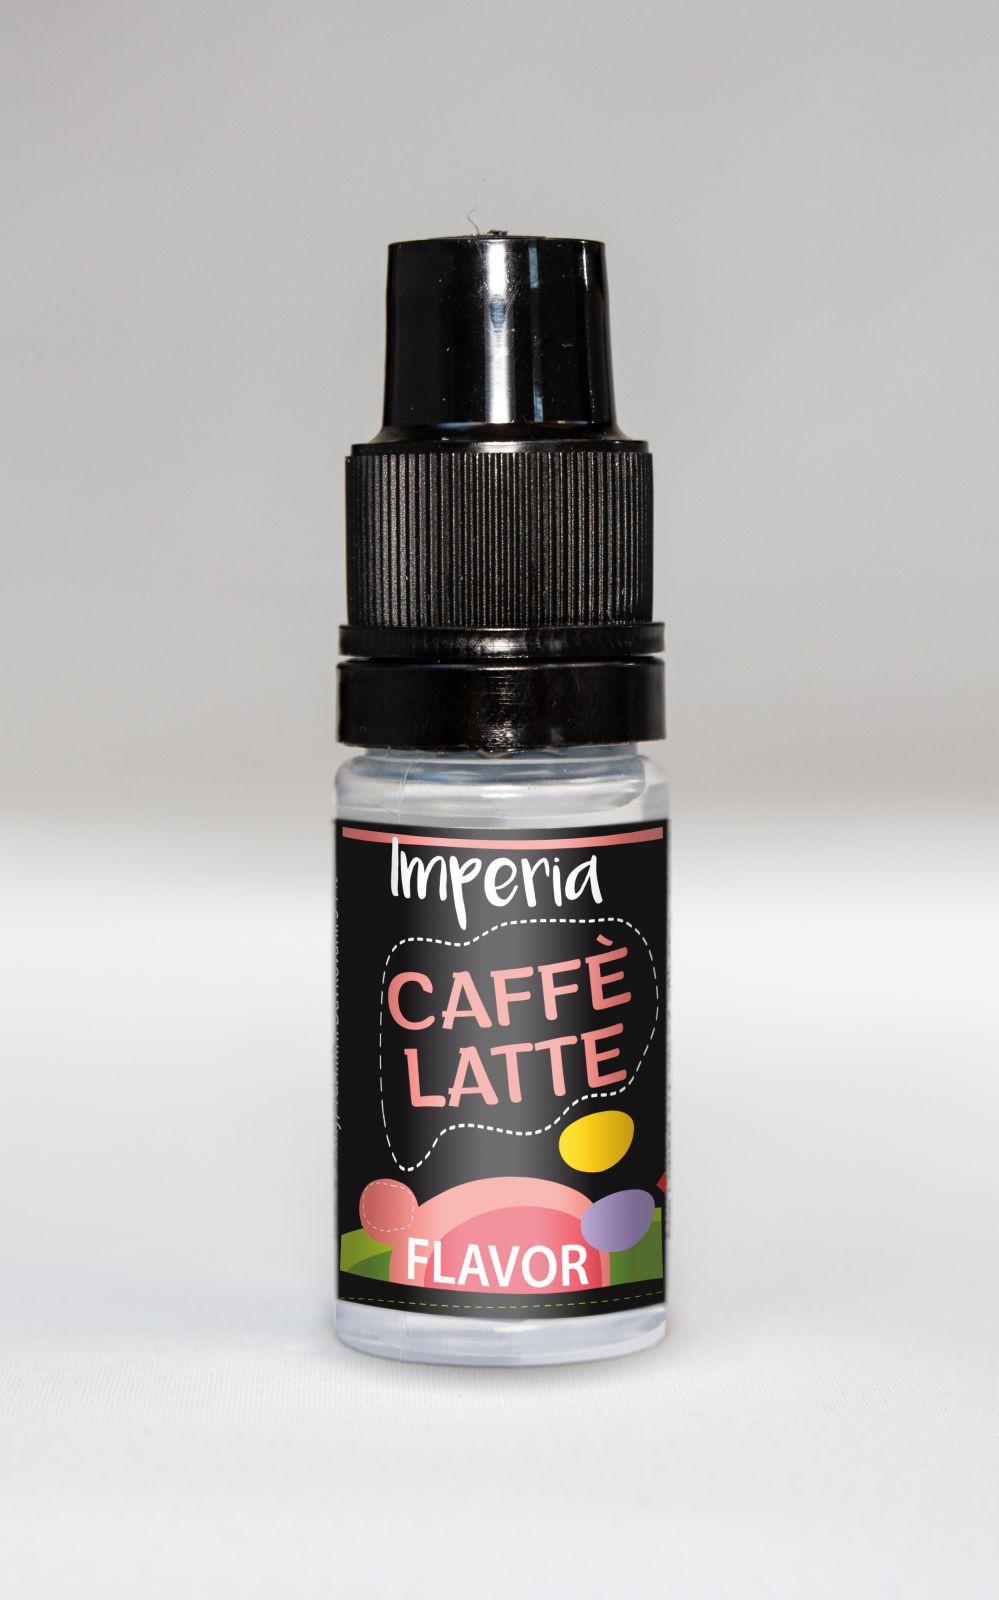 CAFFÉ LATTE - Aróma Imperia Black Label Boudoir Samadhi s.r.o.